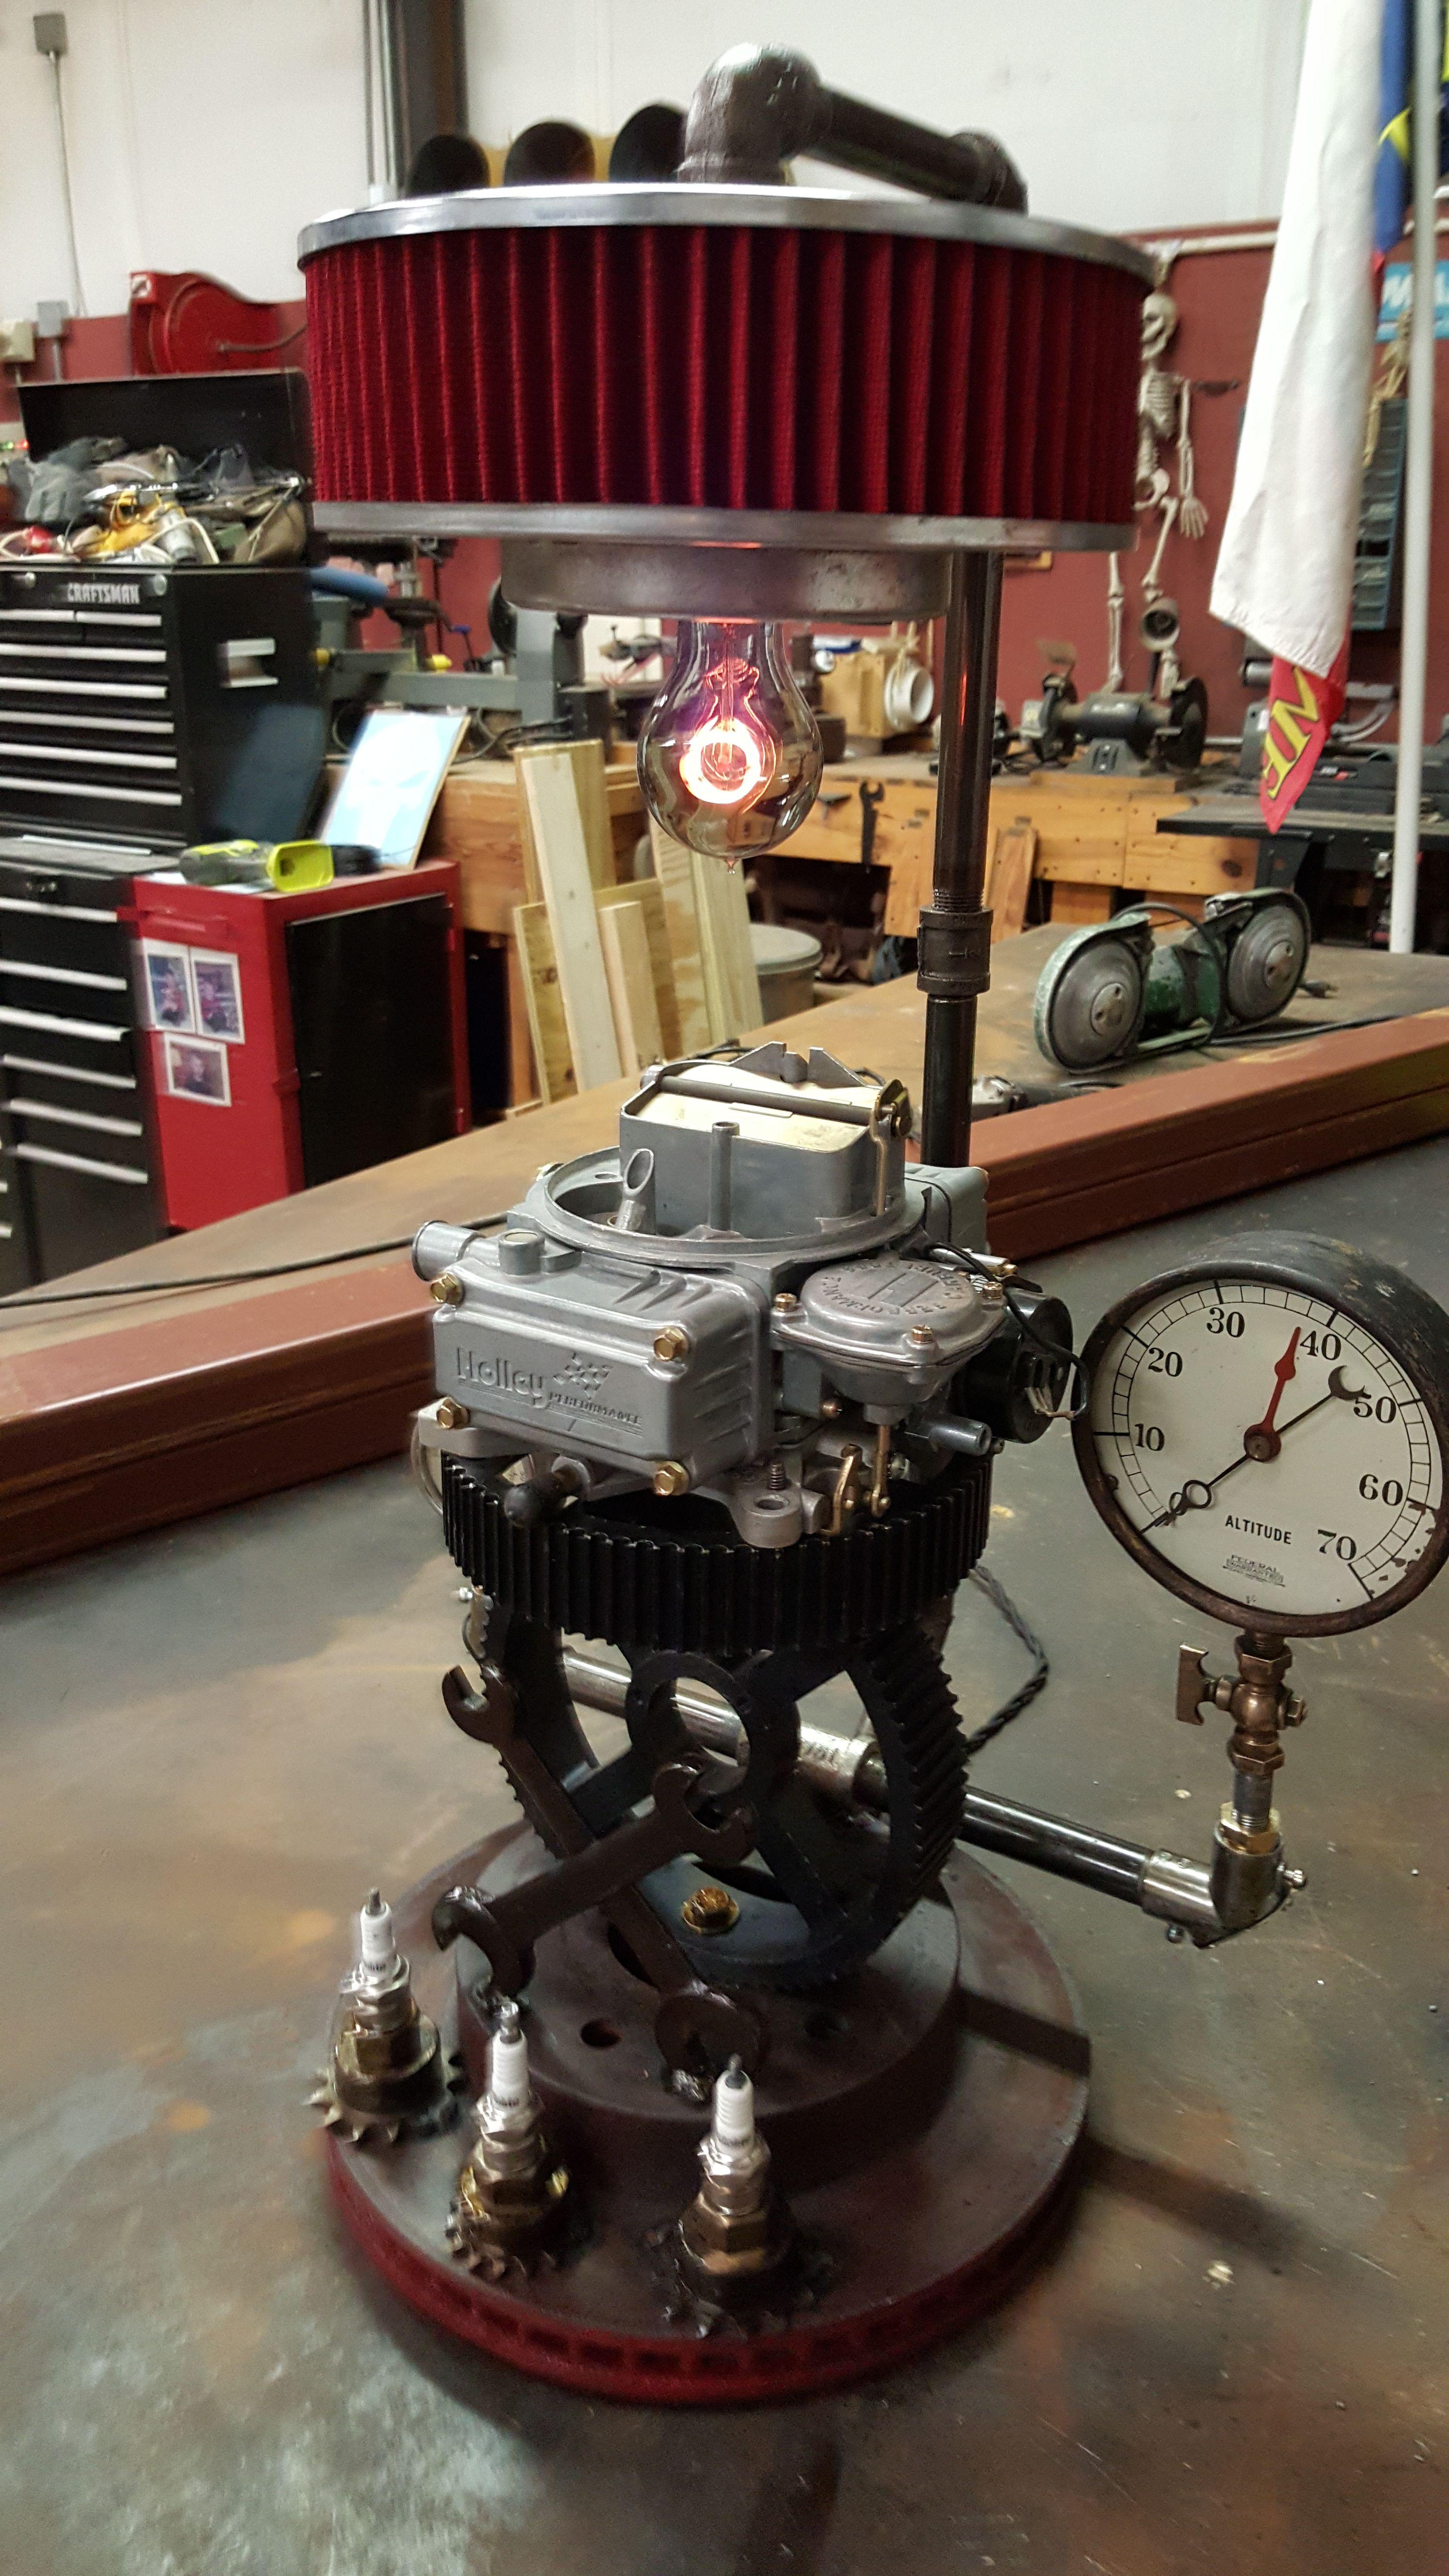 Used Holley 1850 650 Cfm Carburetor Main